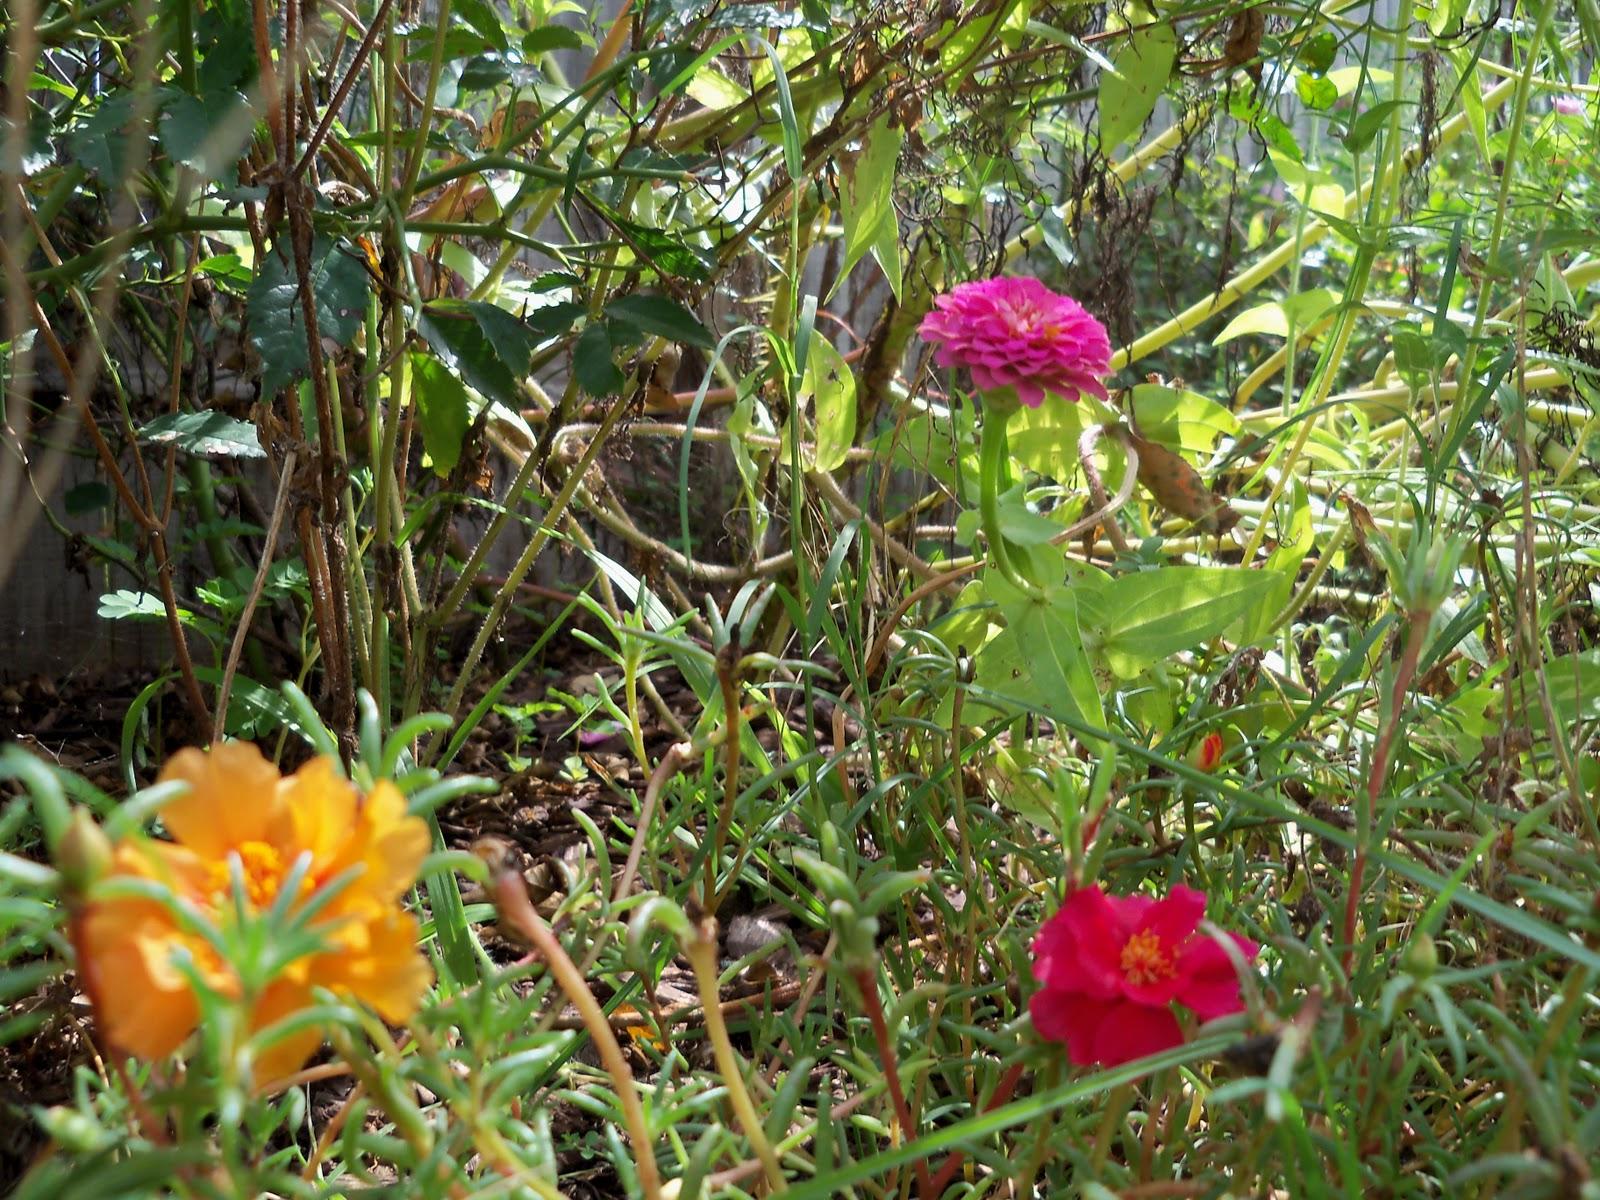 Gardening 2010, Part Three - 101_5190.JPG